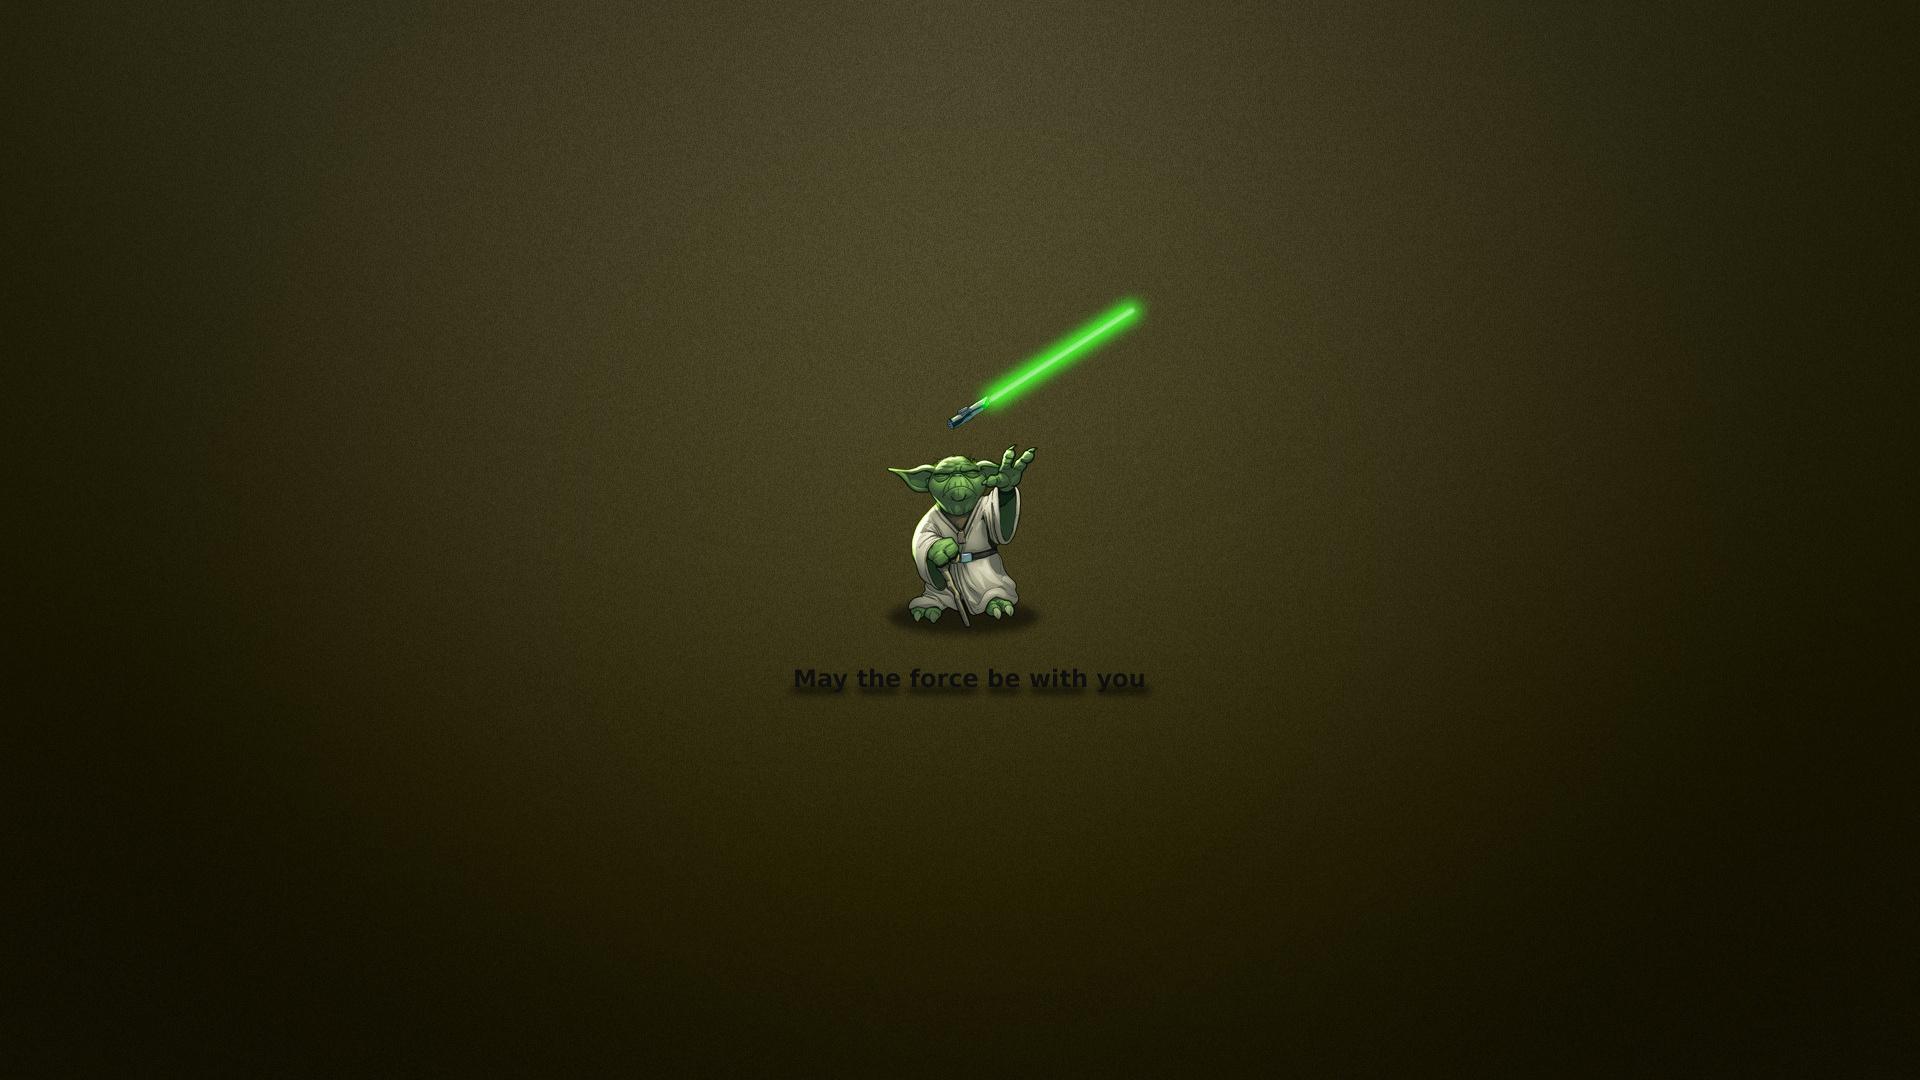 Free Download Wallpaper Star Wars Jedi Yoda Minimalism Widescreen 1920x1080 On 1920x1080 For Your Desktop Mobile Tablet Explore 47 Star Wars Jedi Wallpaper Hd Star Wars Hd Wallpapers Jedi